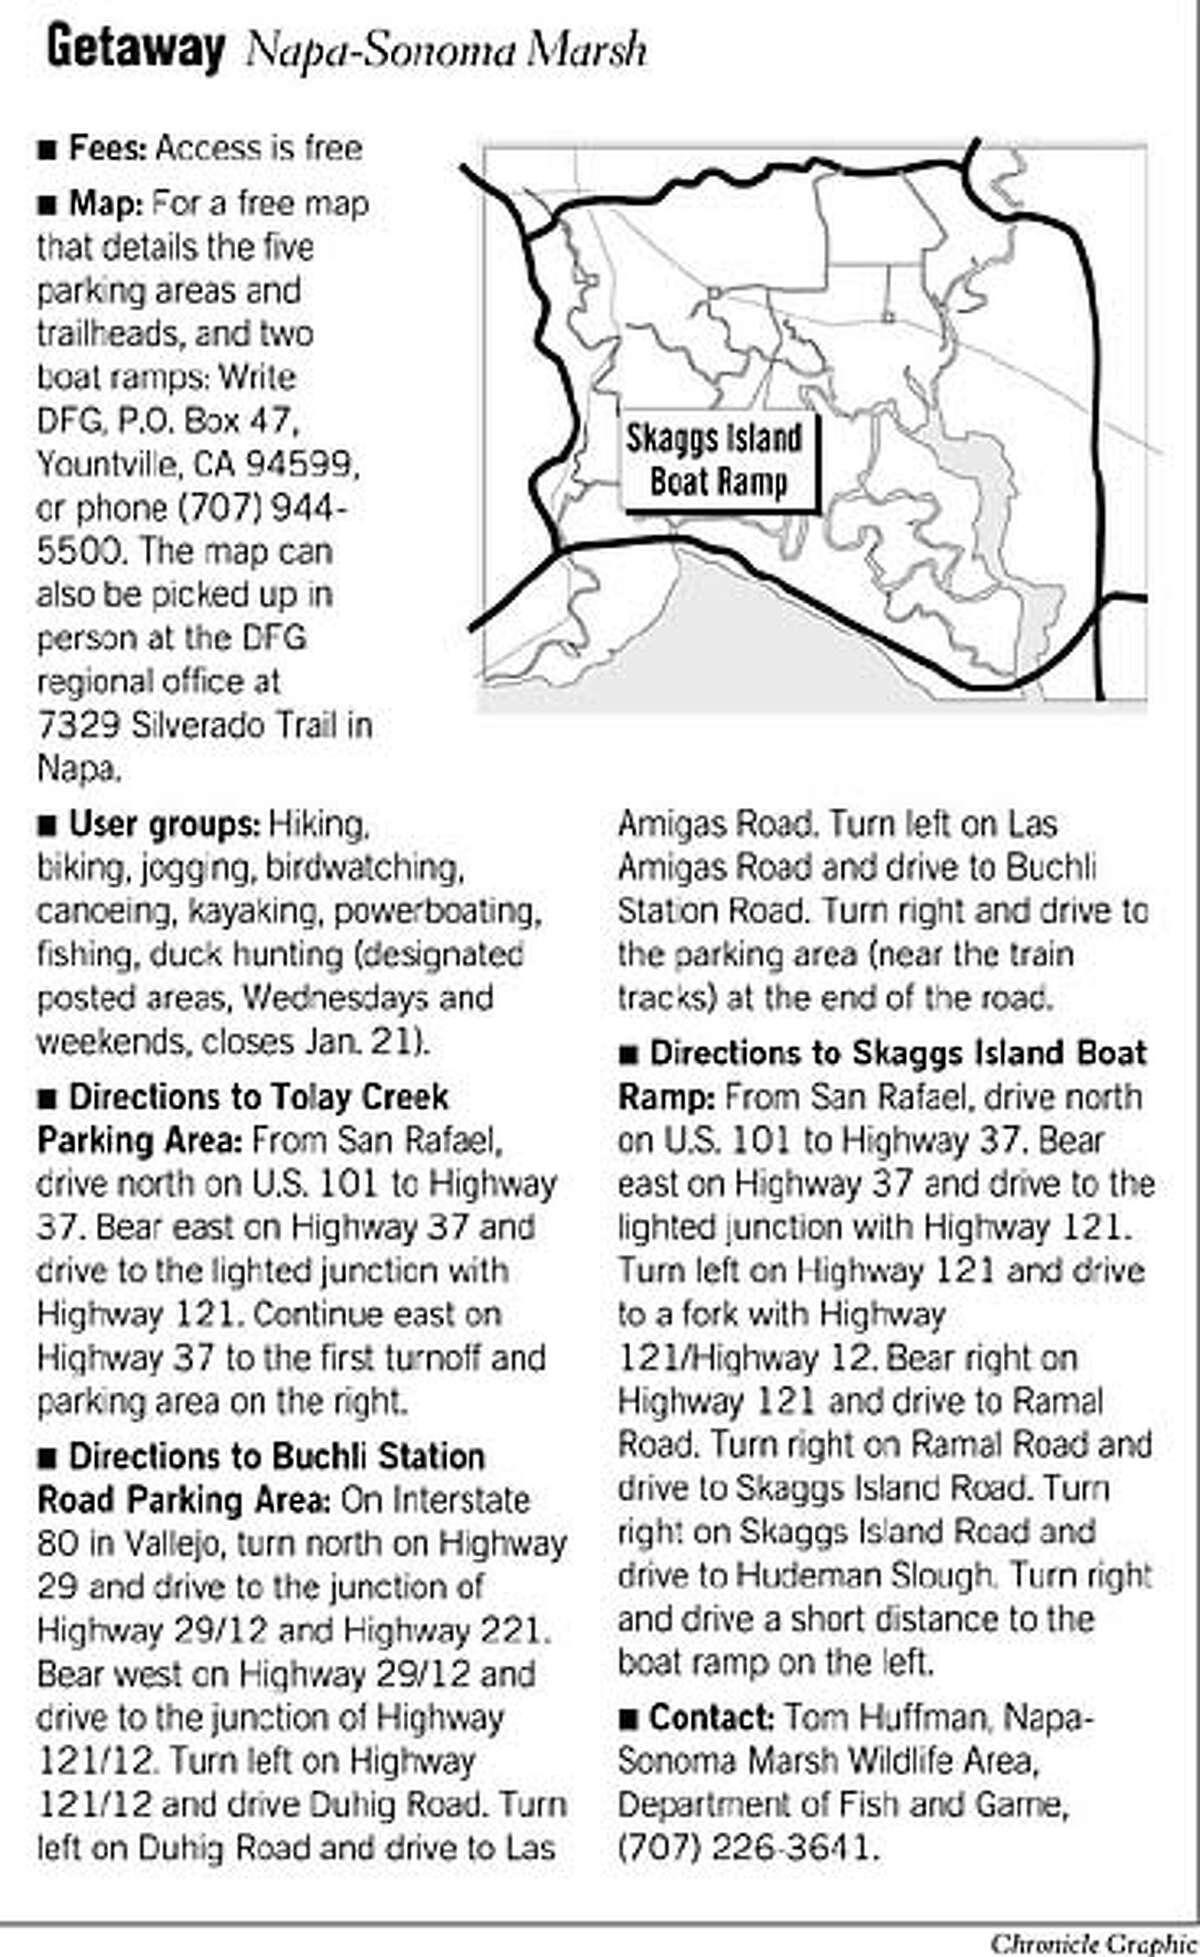 Getaway: Napa-Sonoma Marsh. Chronicle Graphic